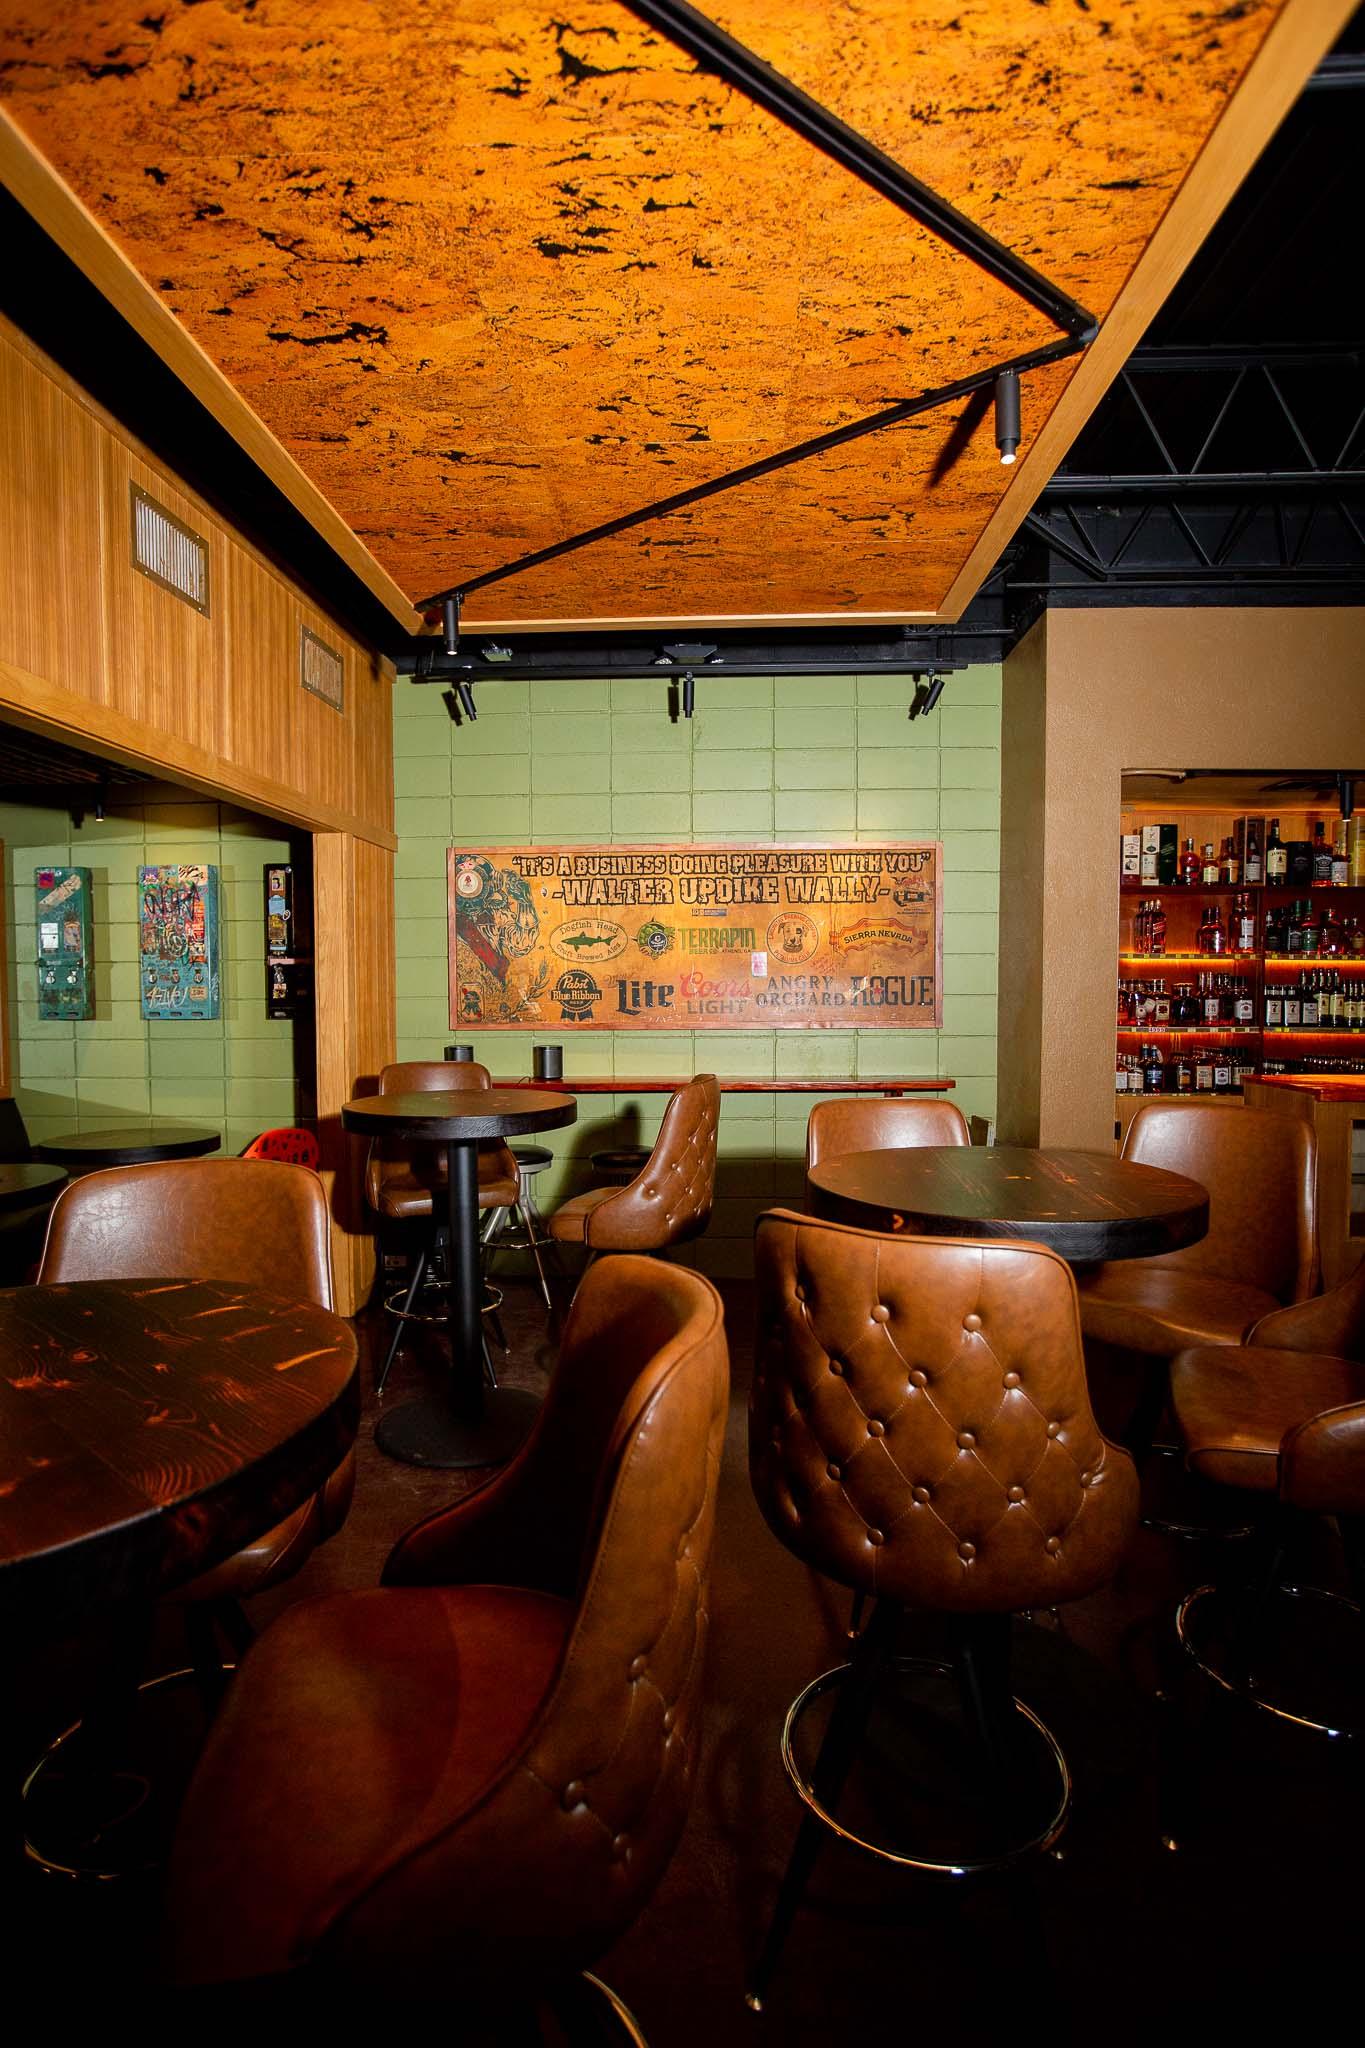 Wallys-Bar-Room.jpg